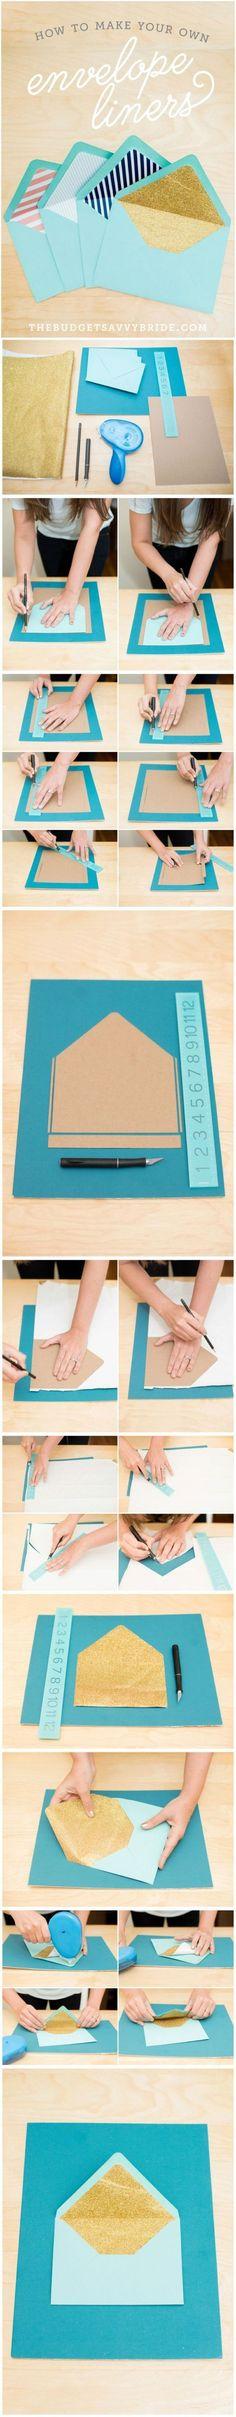 DIY envelope liners / http://www.himisspuff.com/diy-wedding-invitations/16/